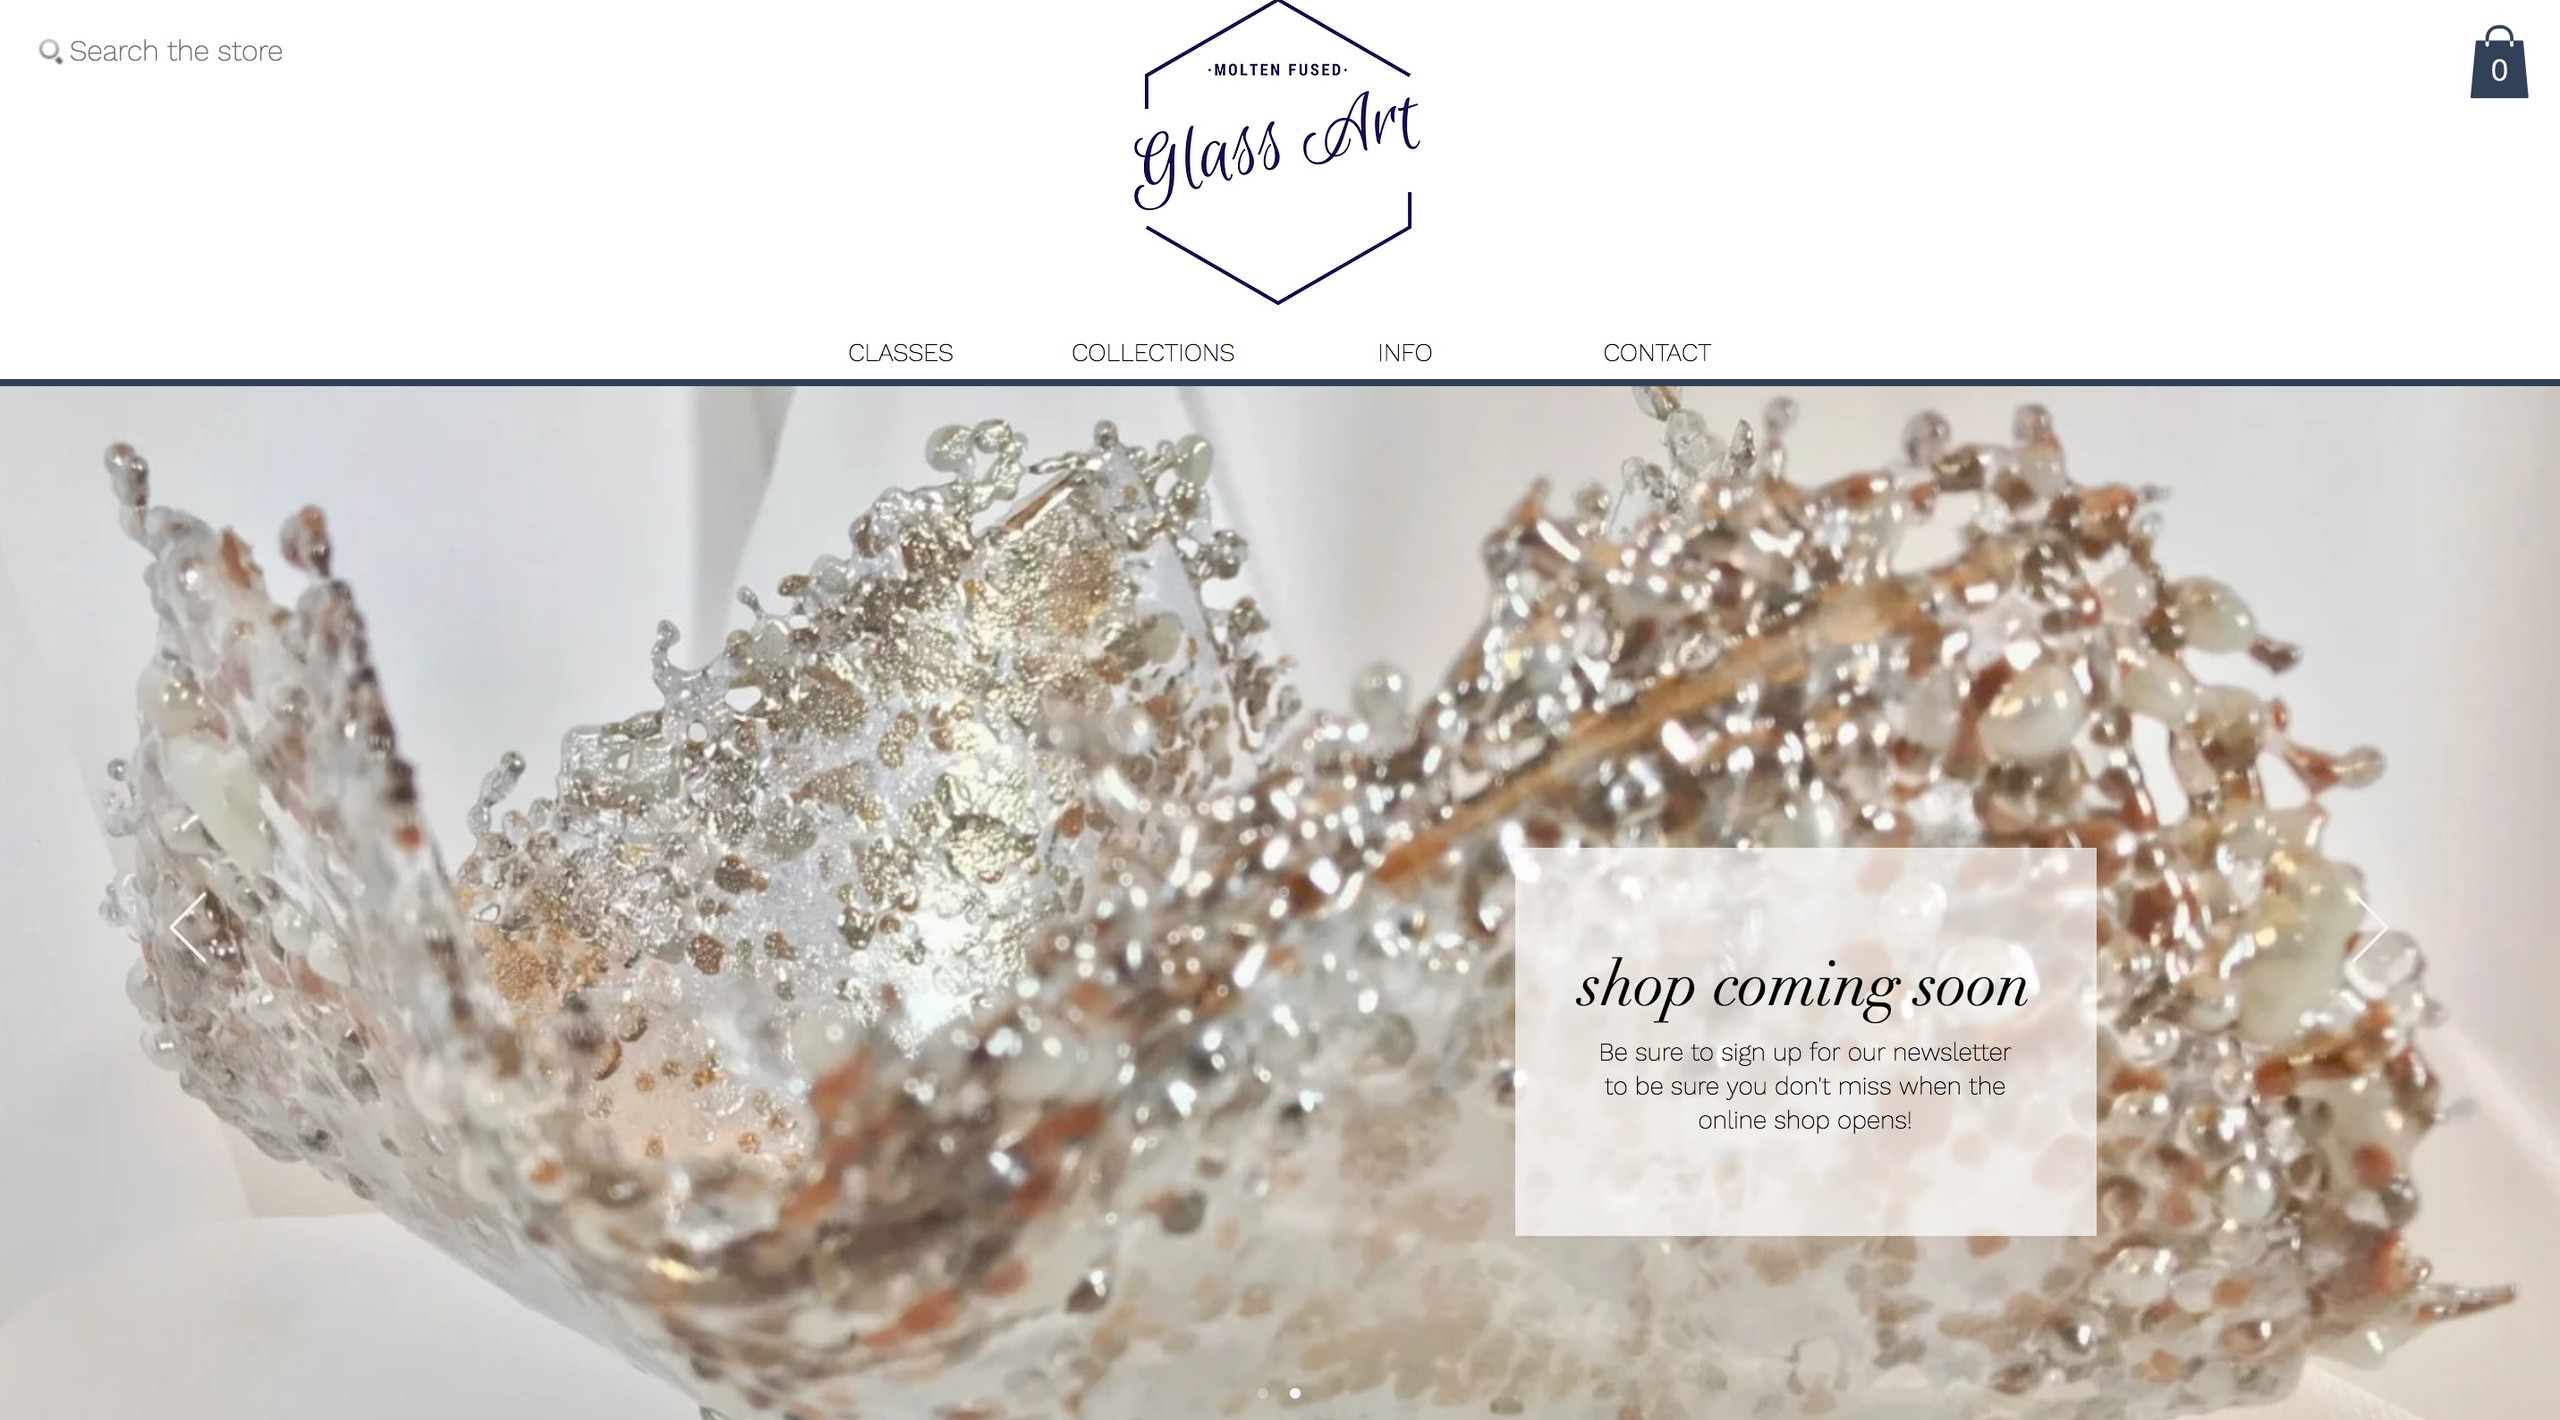 Molten Fused Glass Art Website Design